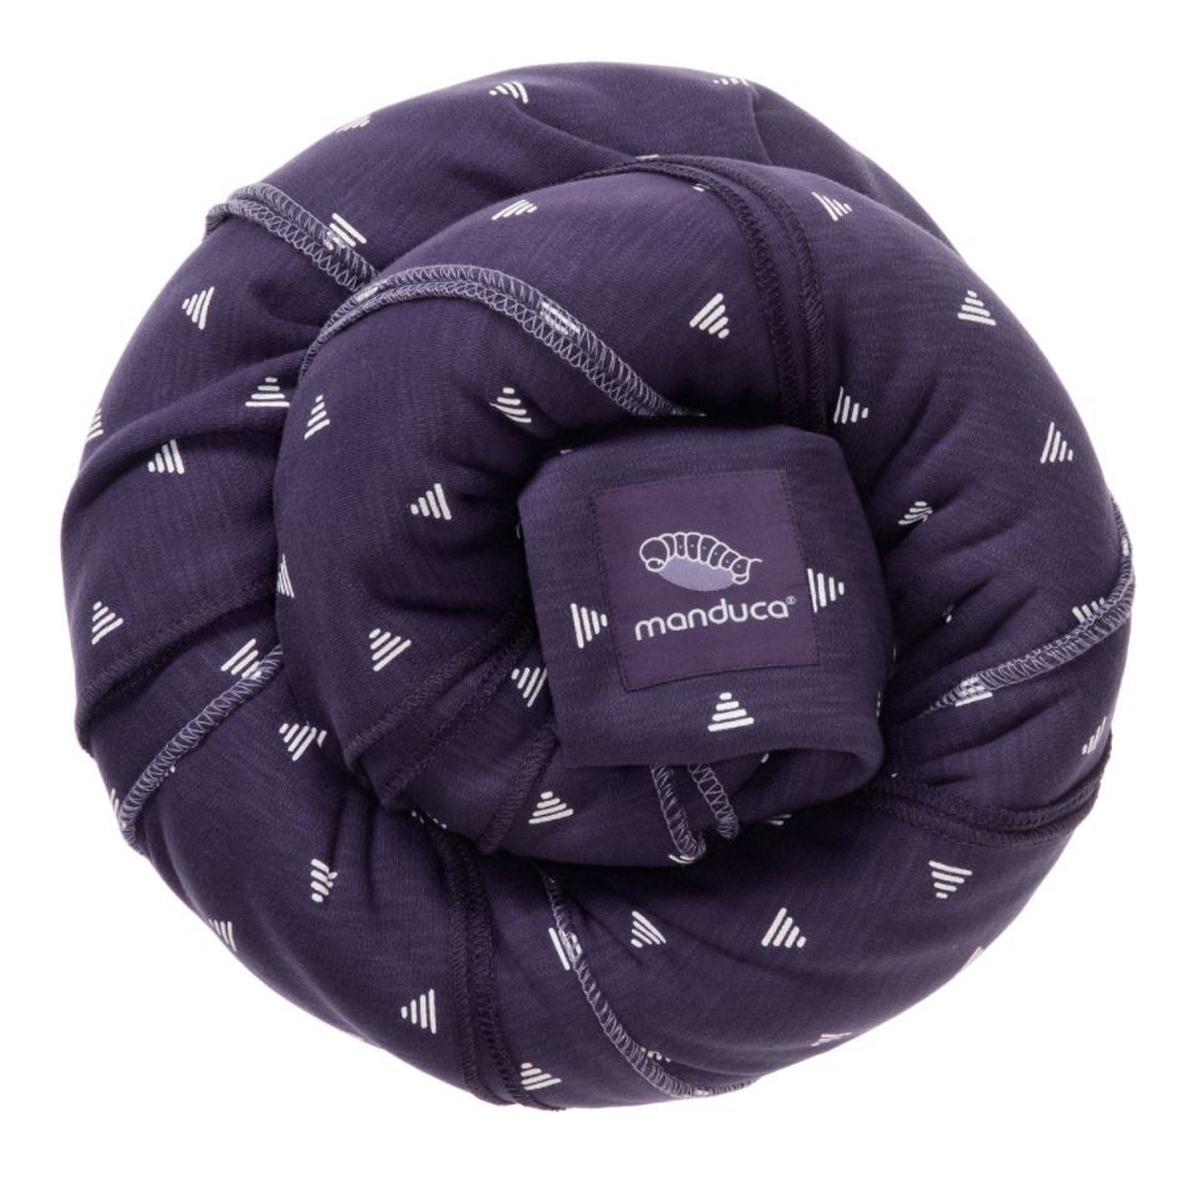 Porte bébé Echarpe de Portage Sling Edition Limitée - Purple Darts Echarpe de Portage Sling Edition Limitée - Purple Darts